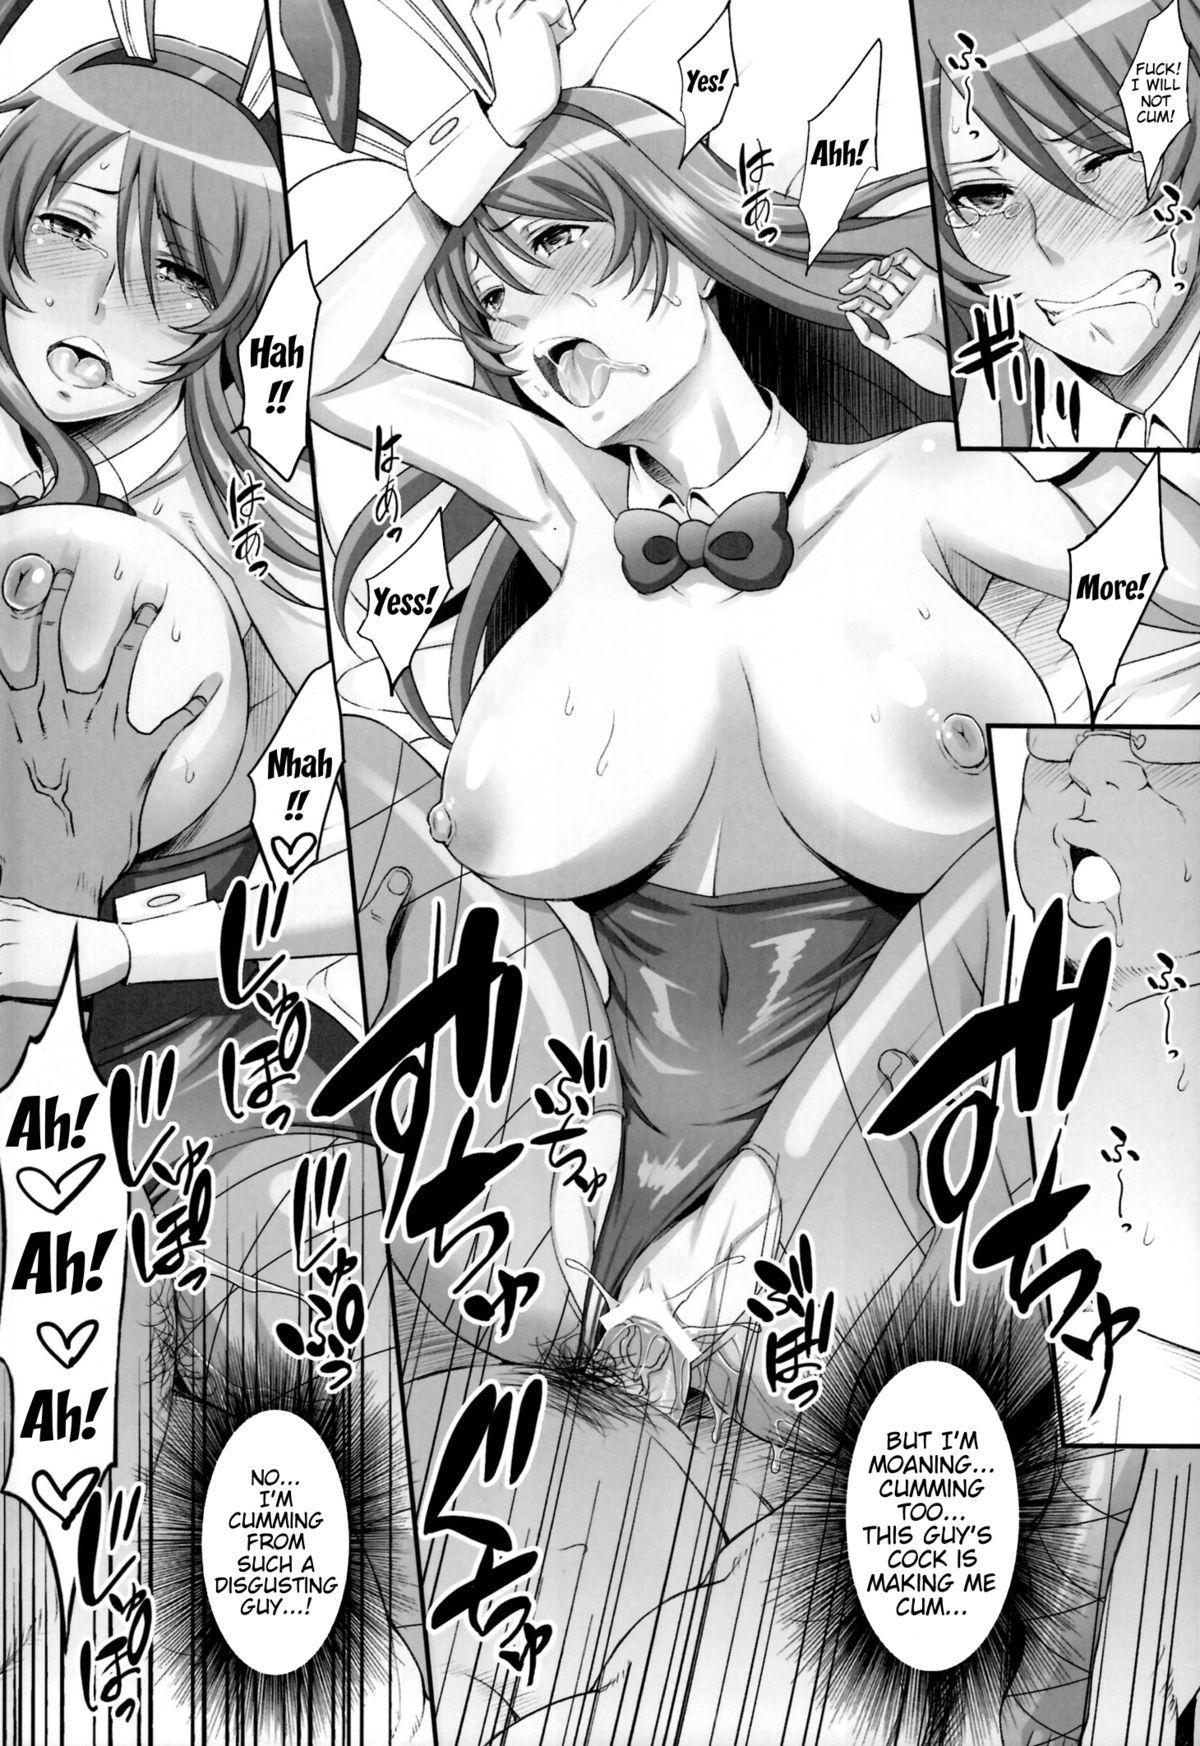 (C86) [Diogenes Club (Haikawa Hemlen)] Shokukan Mankan Zenseki Go Touki Ryoujoku   Shokukan Mankan Zenseki 5 - Princess Rape Battle- Cosplay Kanu (Ikkitousen) [English] {doujin-moe.us} 18